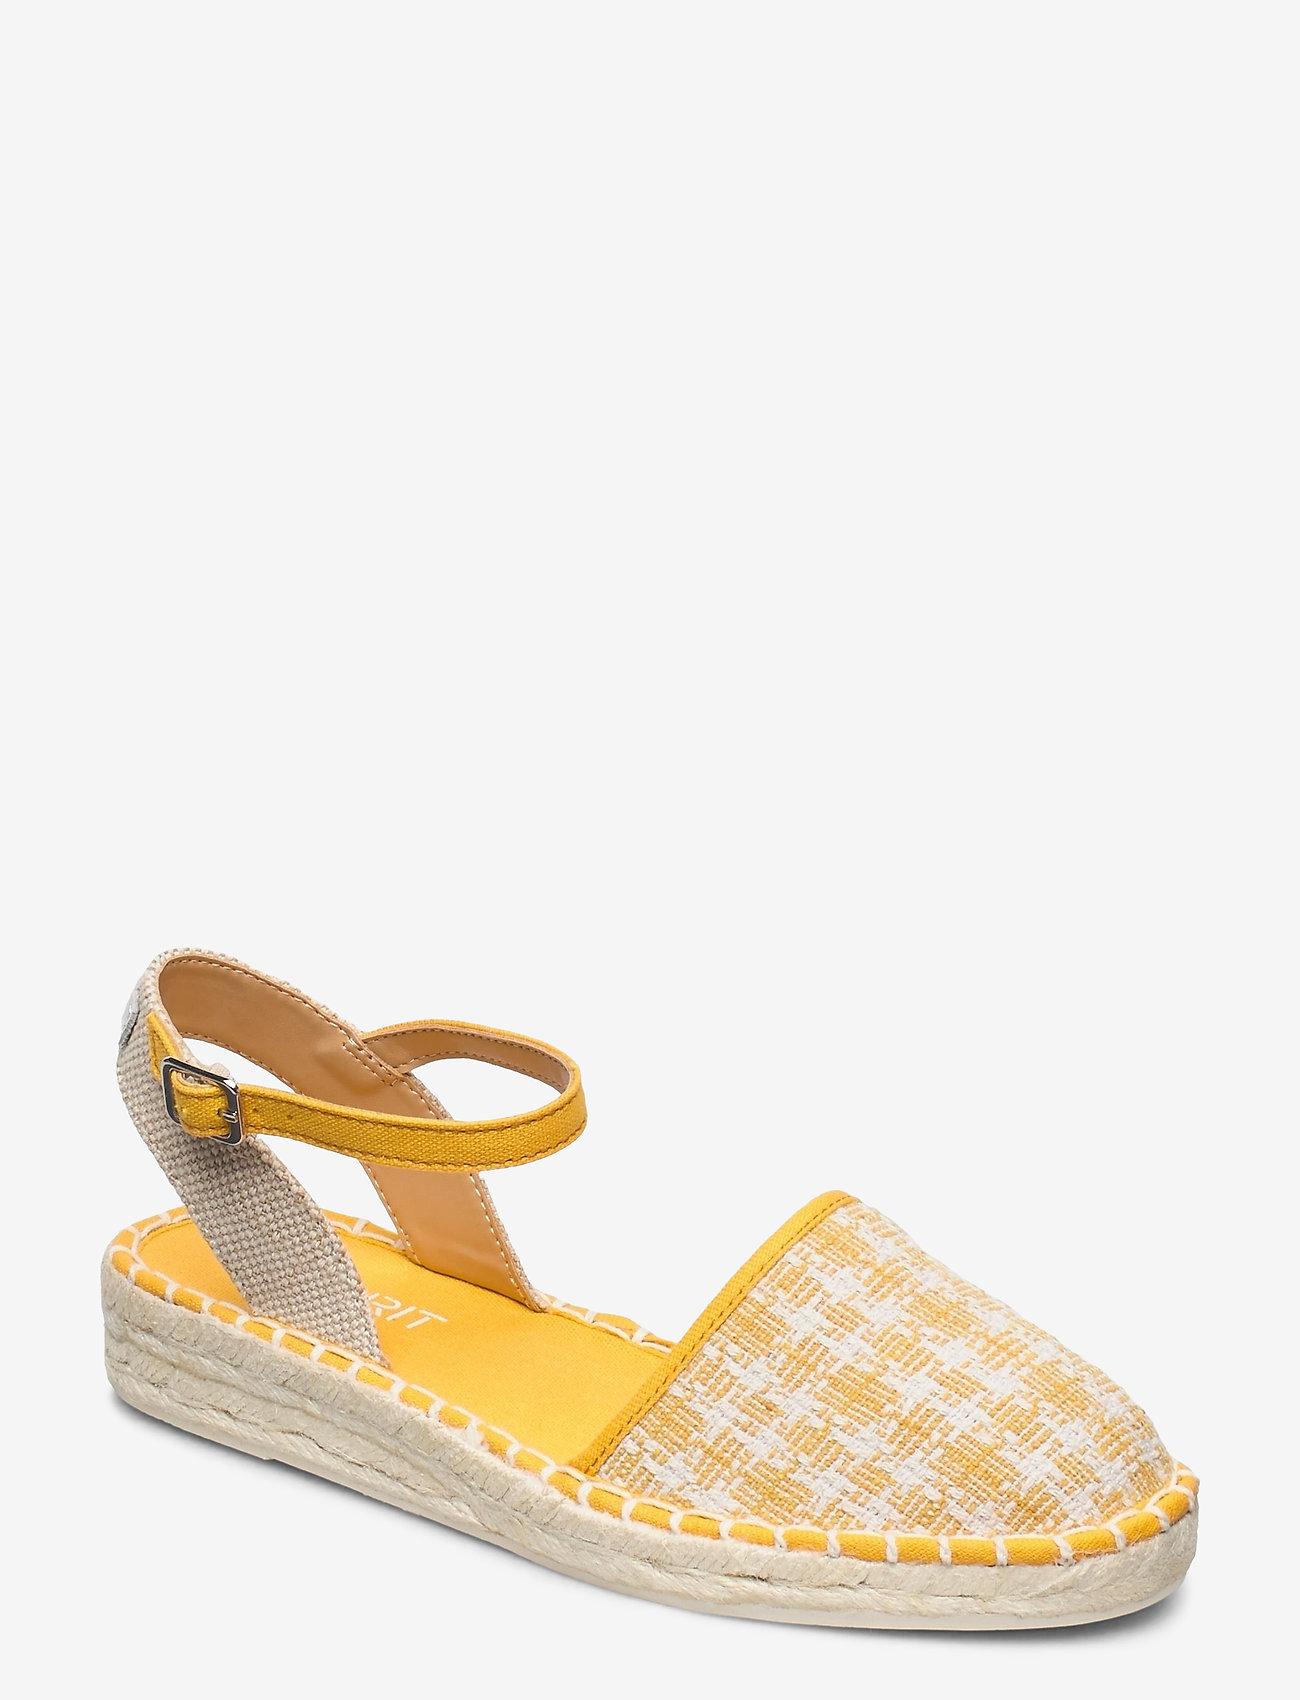 Esprit Casual - Casual Shoes textile - platta espadriller - sunflower yellow - 0